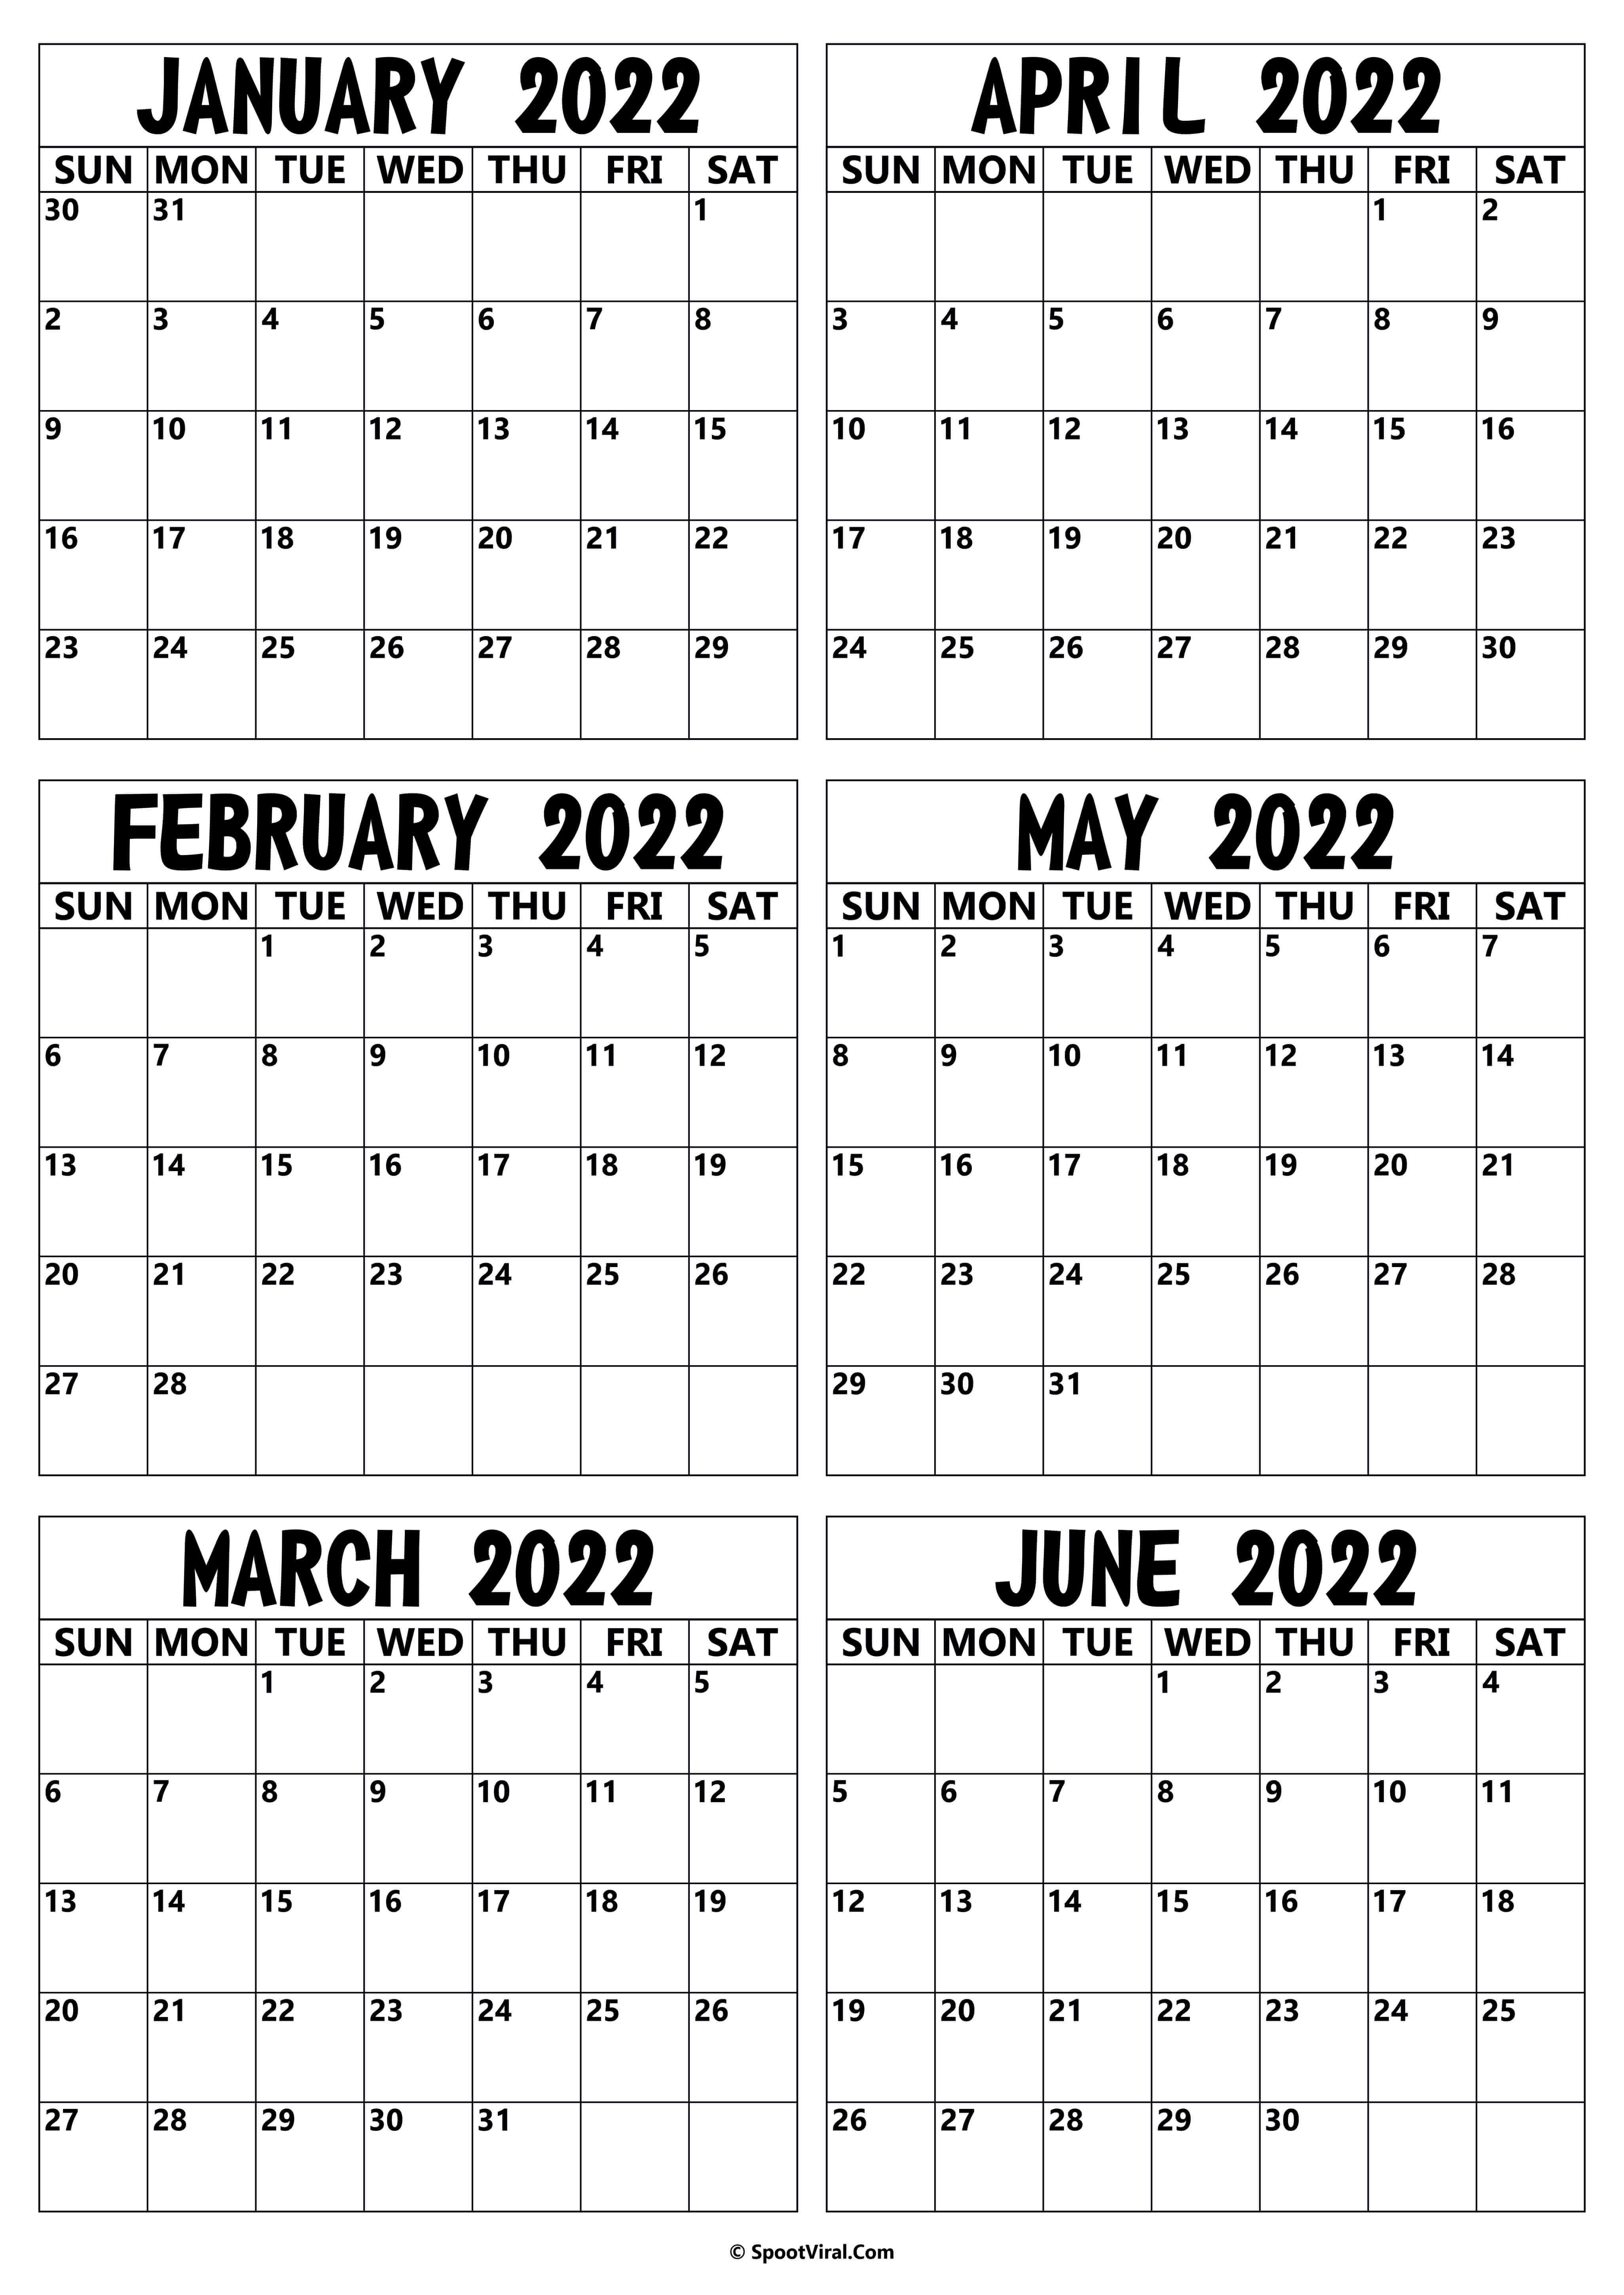 2022 January to June Calendar